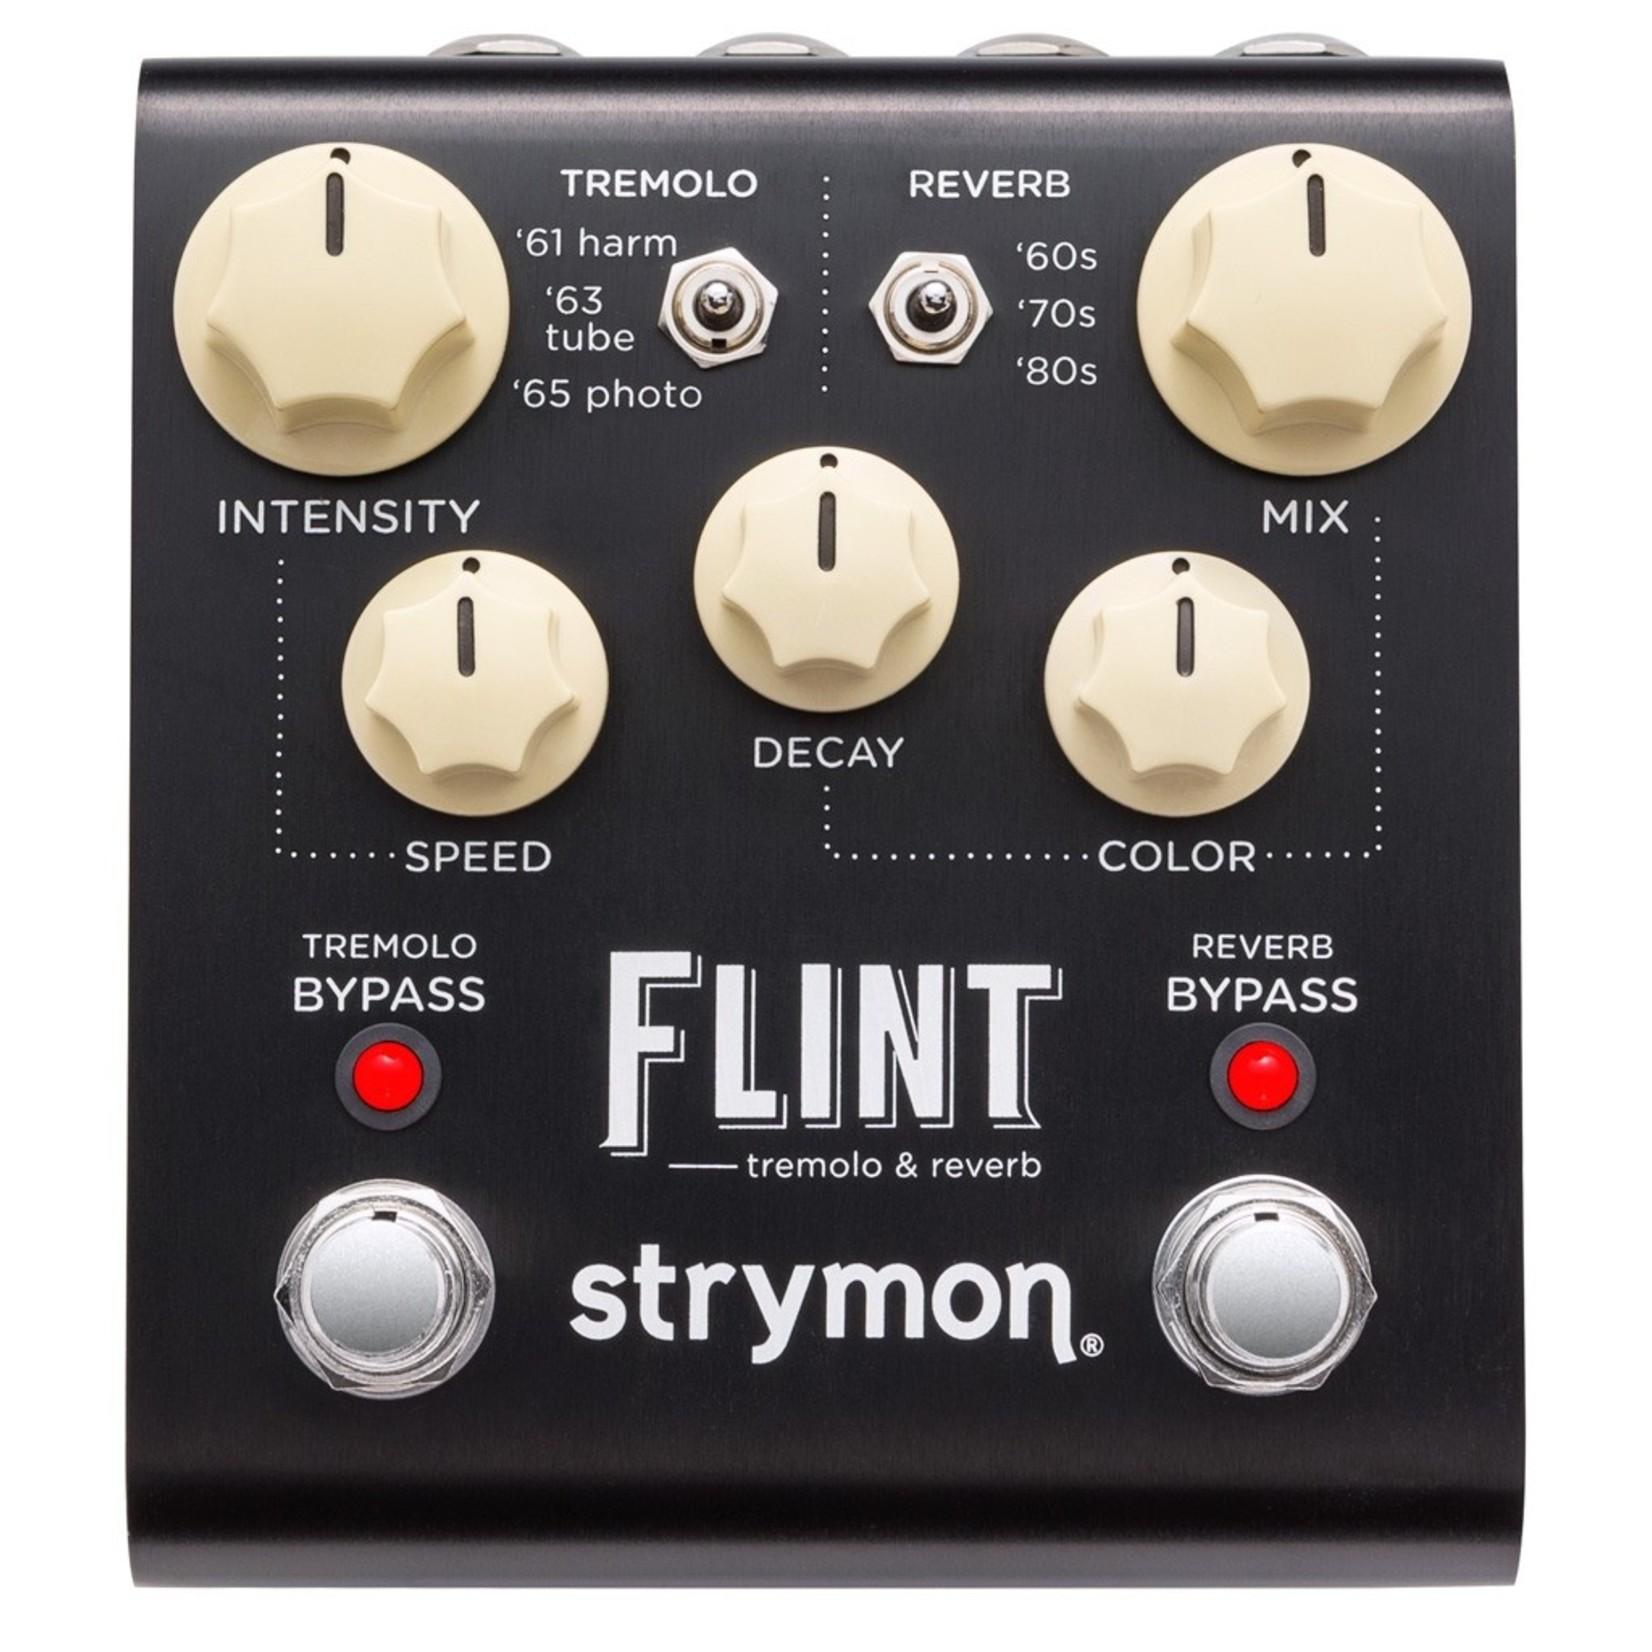 Strymon Strymon Flint Tremolo & Reverb